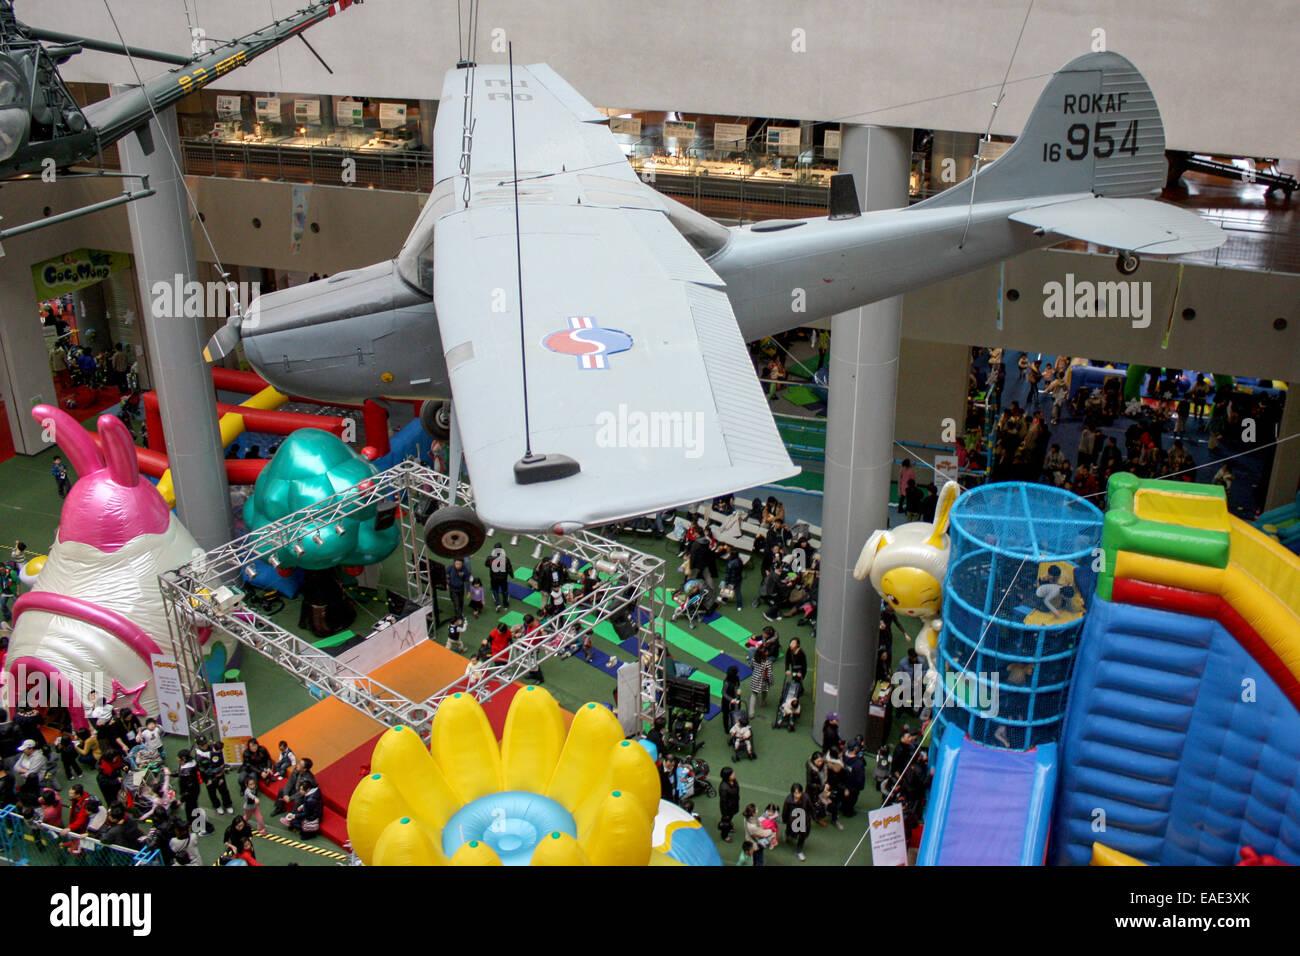 South Korea: Children's playground at War Memorial of Korea, Seoul. Photo from 25. December 2009 Stock Photo